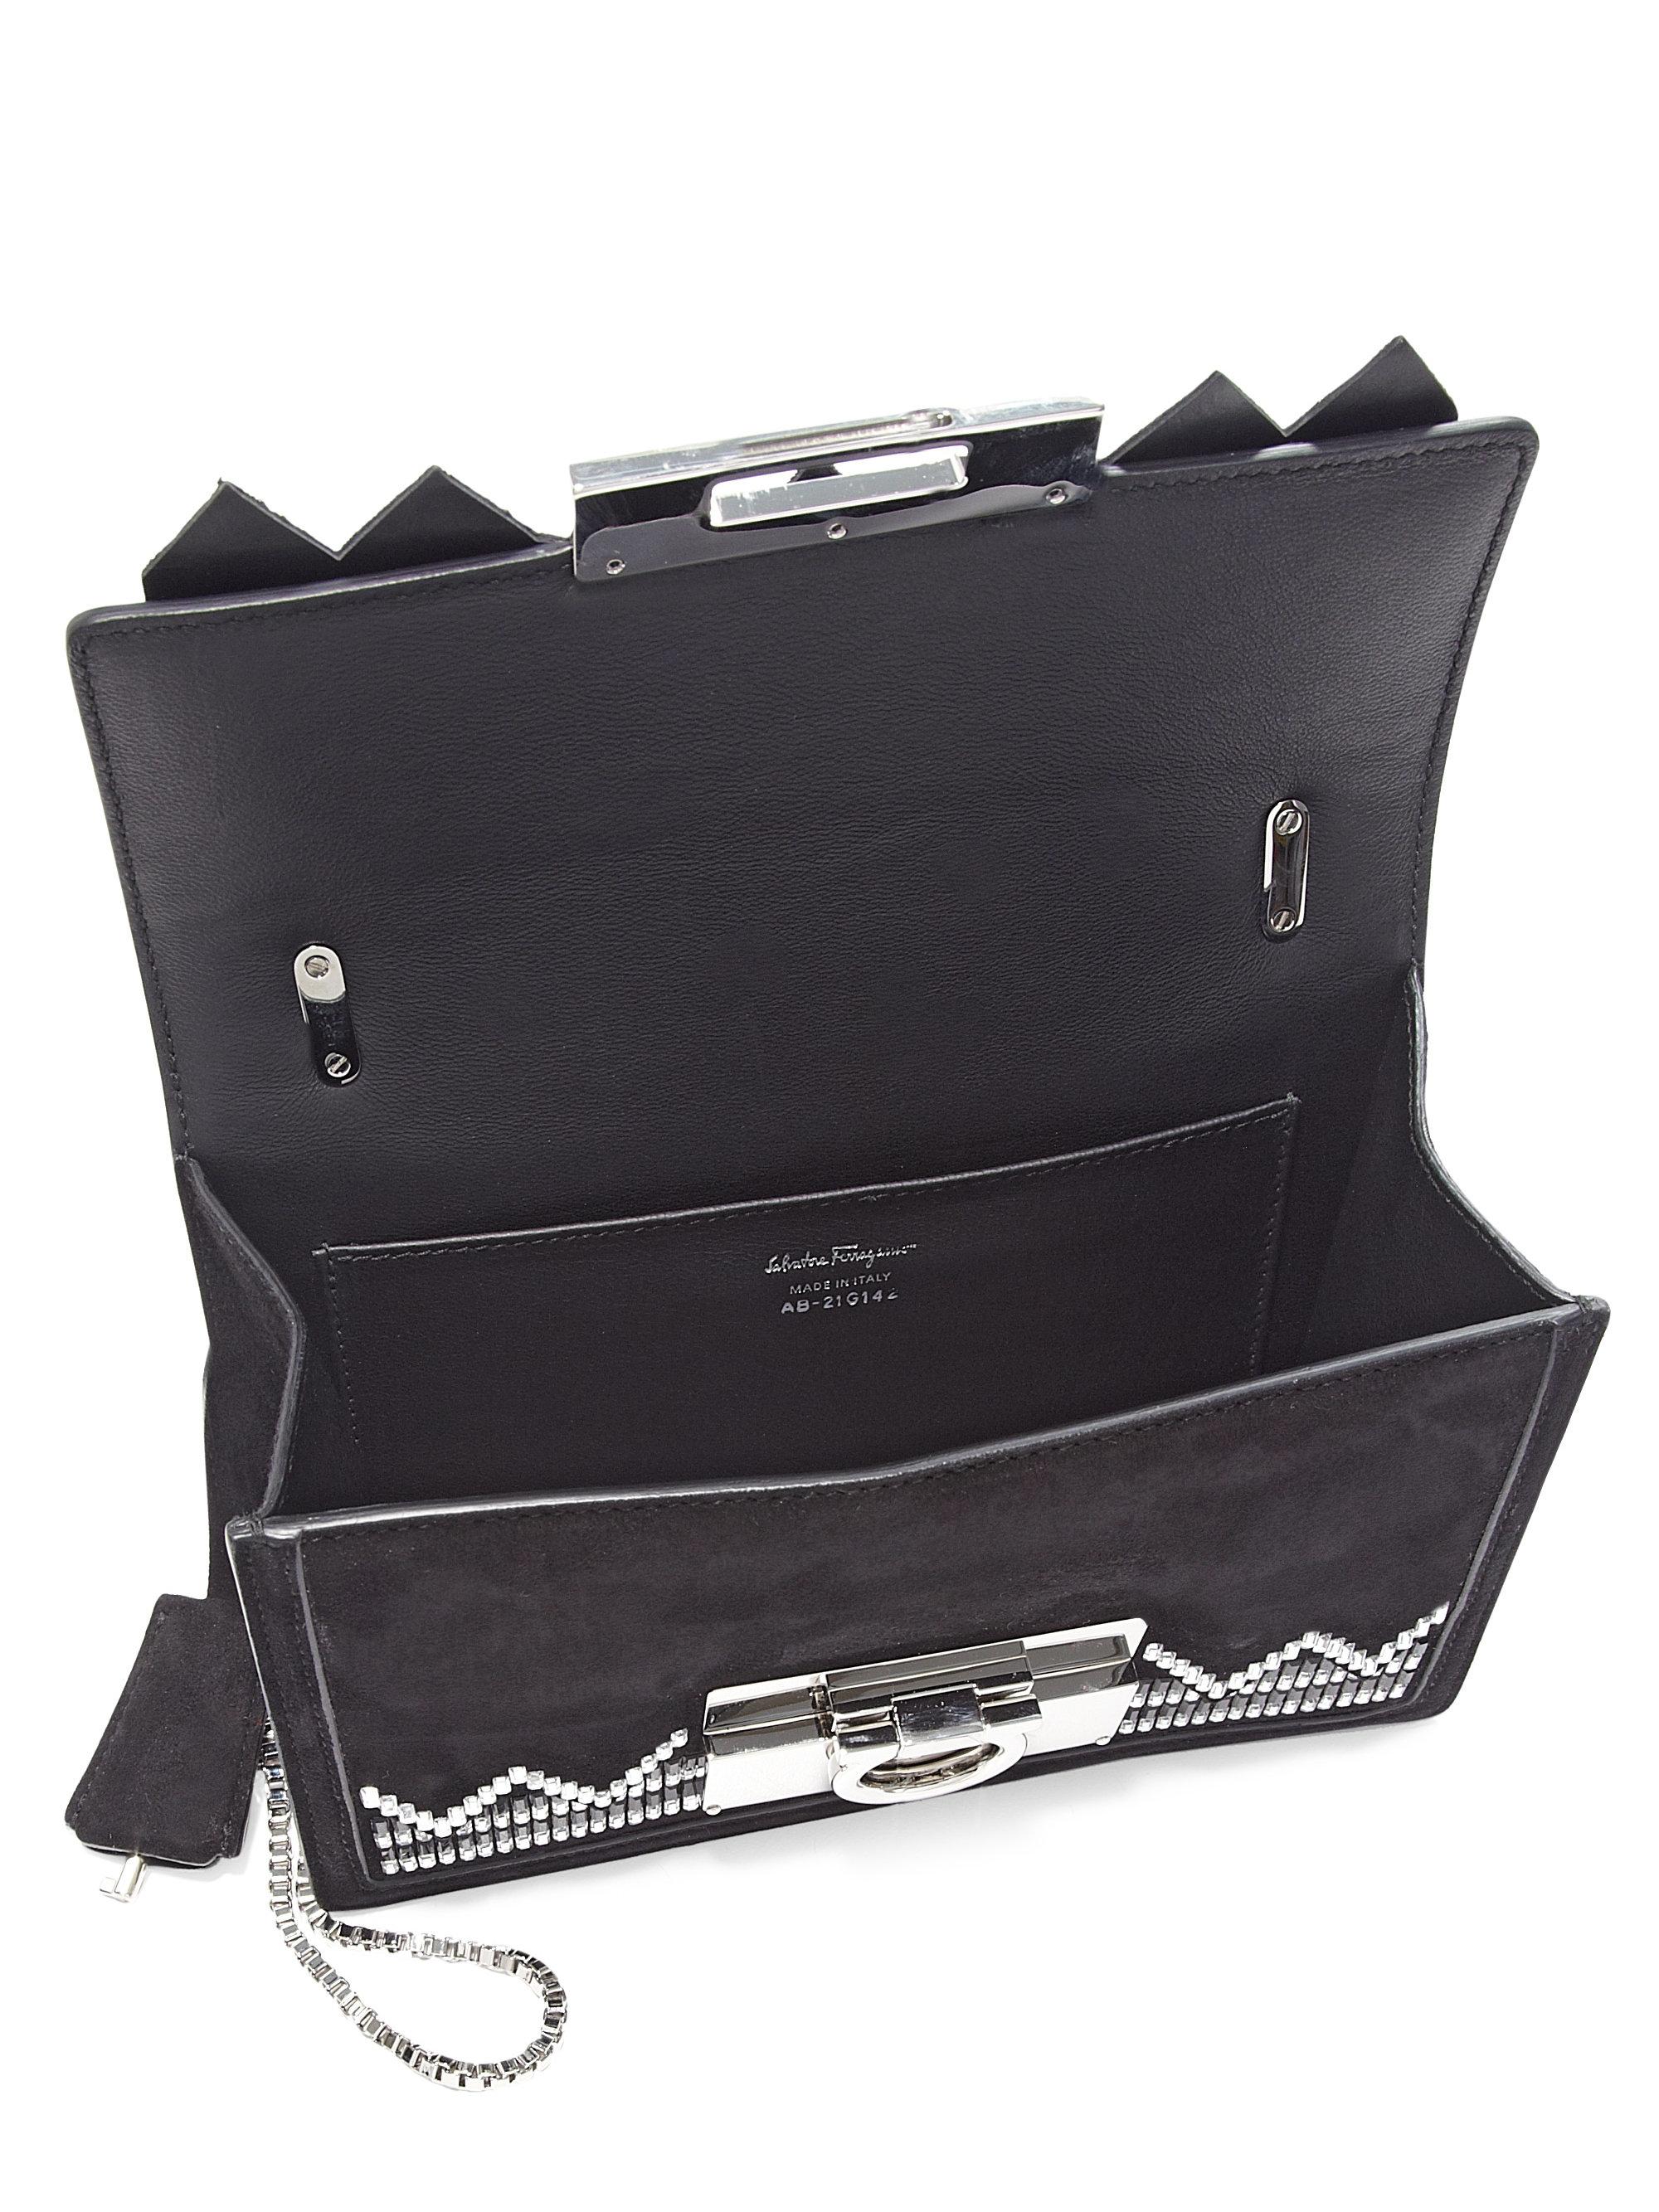 94364a3745 Lyst - Ferragamo Aileen Chevron Suede Crossbody Bag in Black